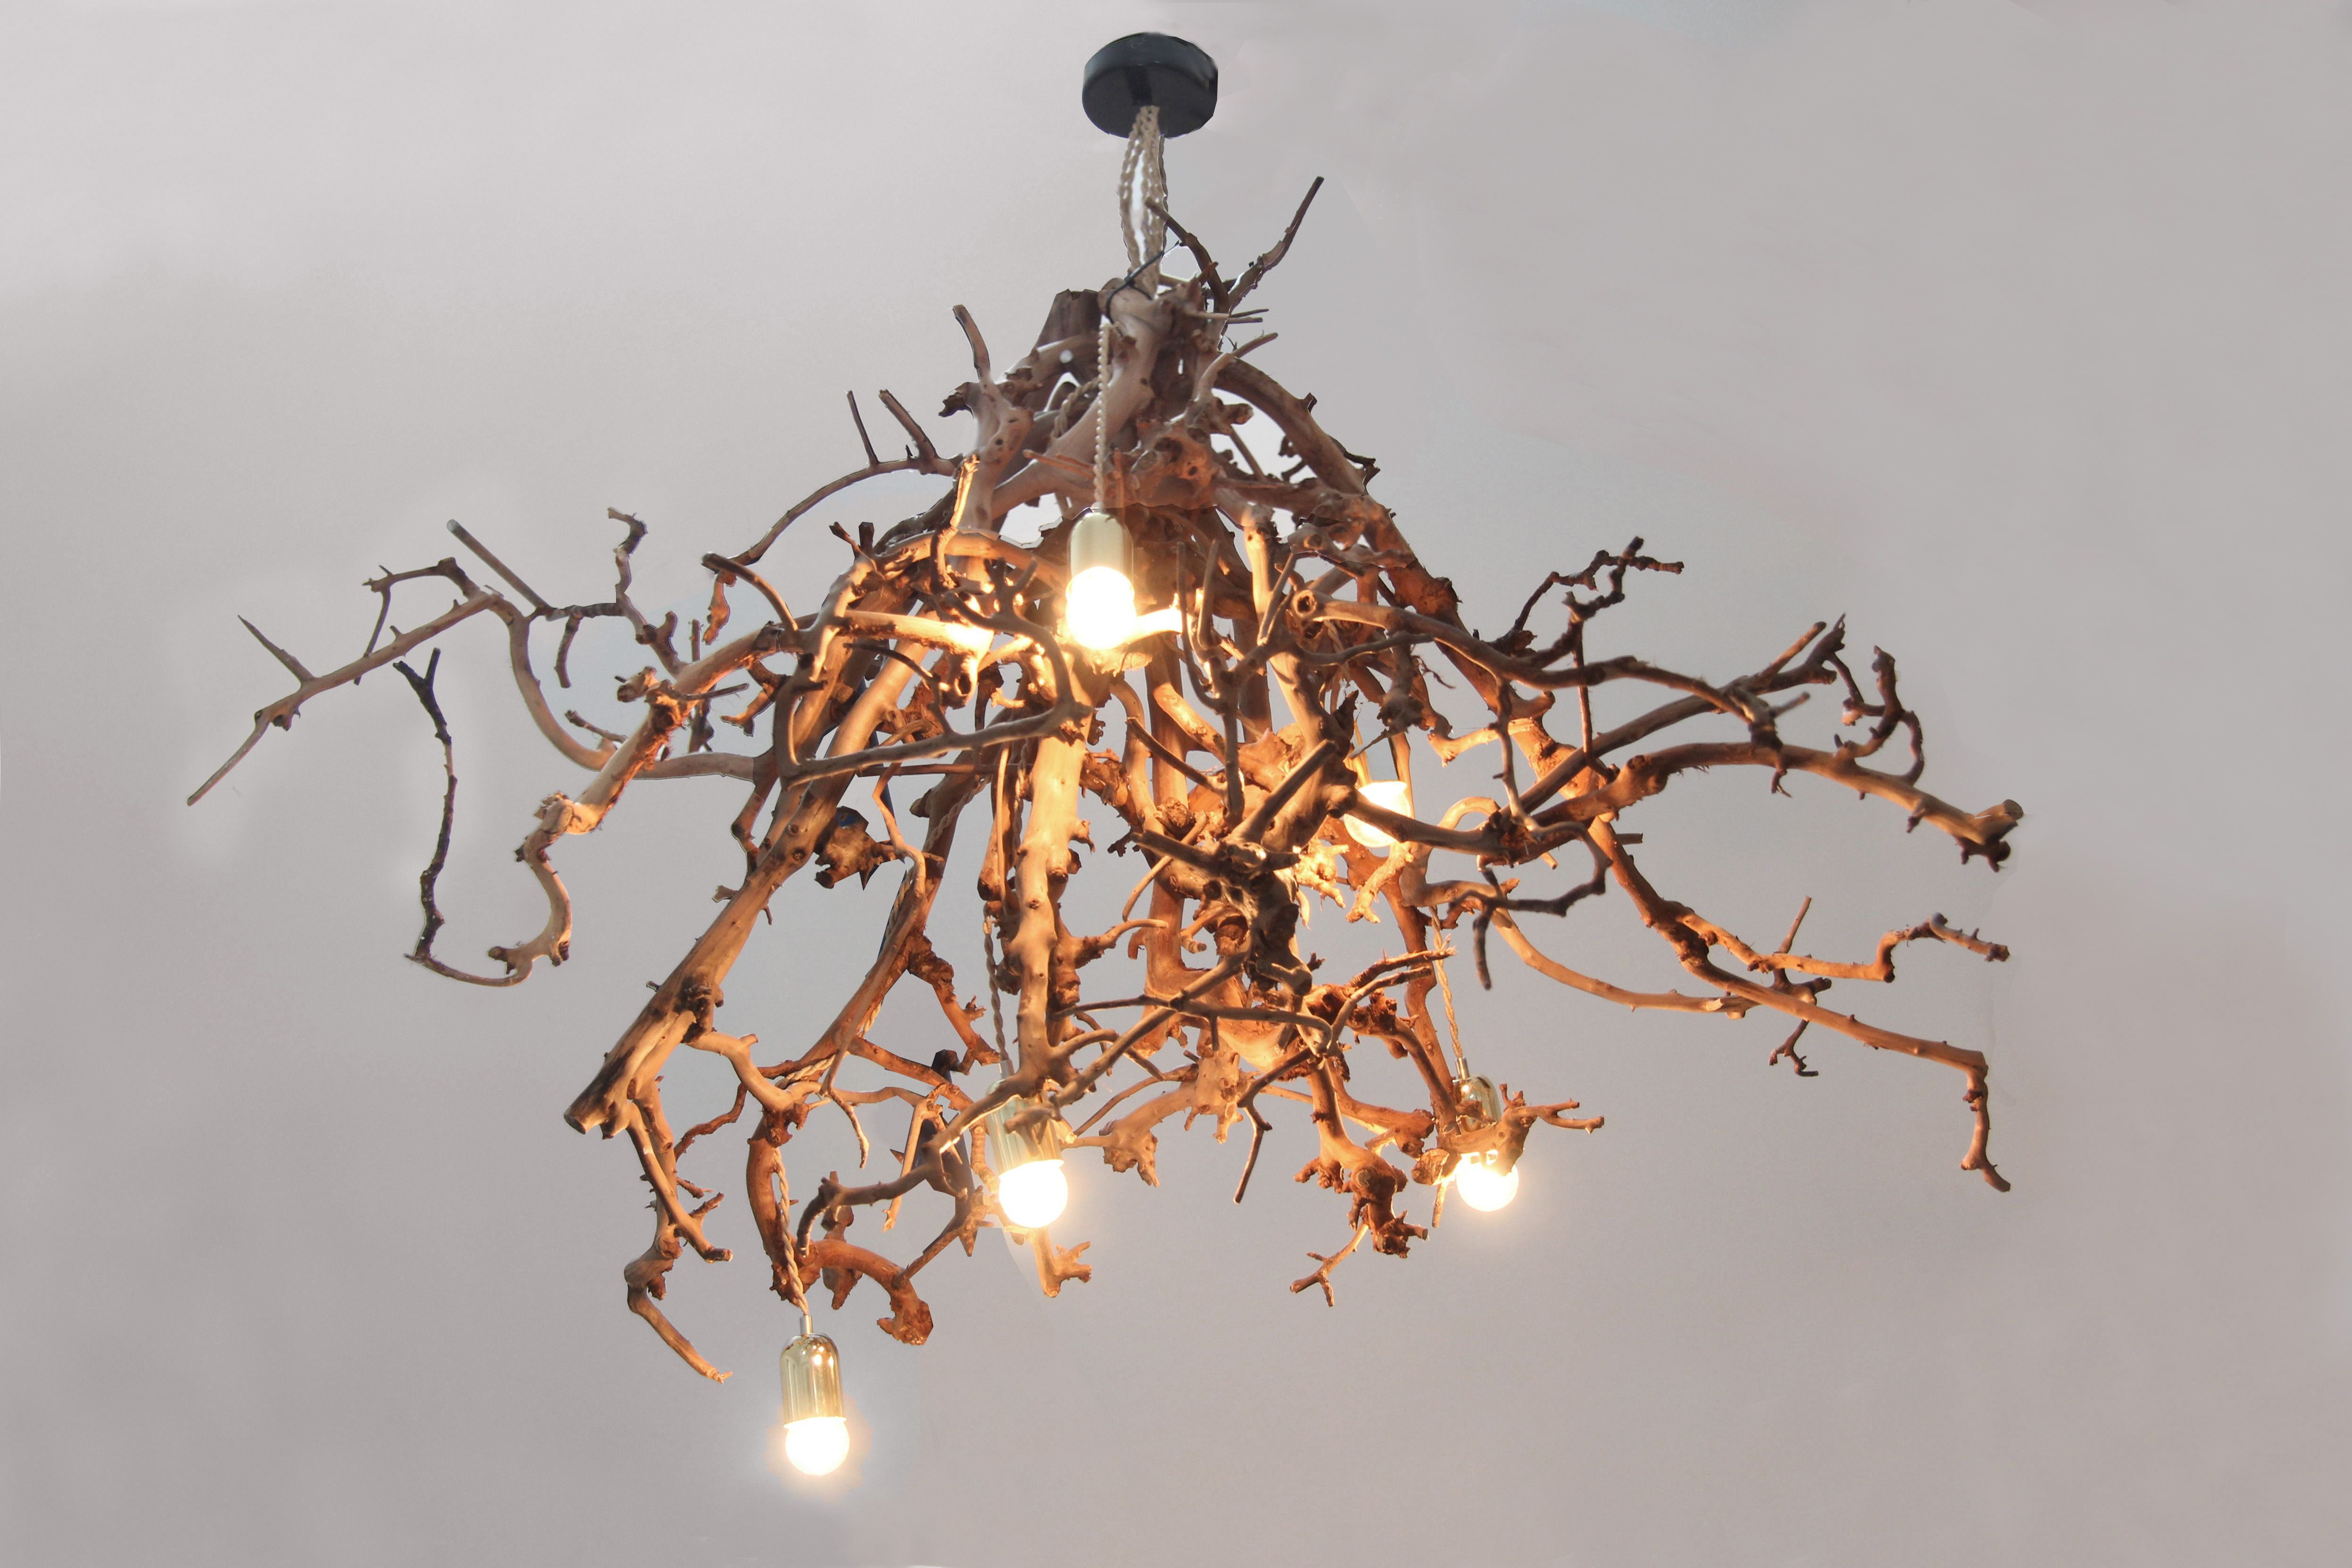 Brocante Slaapkamer Lampen : Houten lampen plafond tafel staande brocante kronkel lamp br